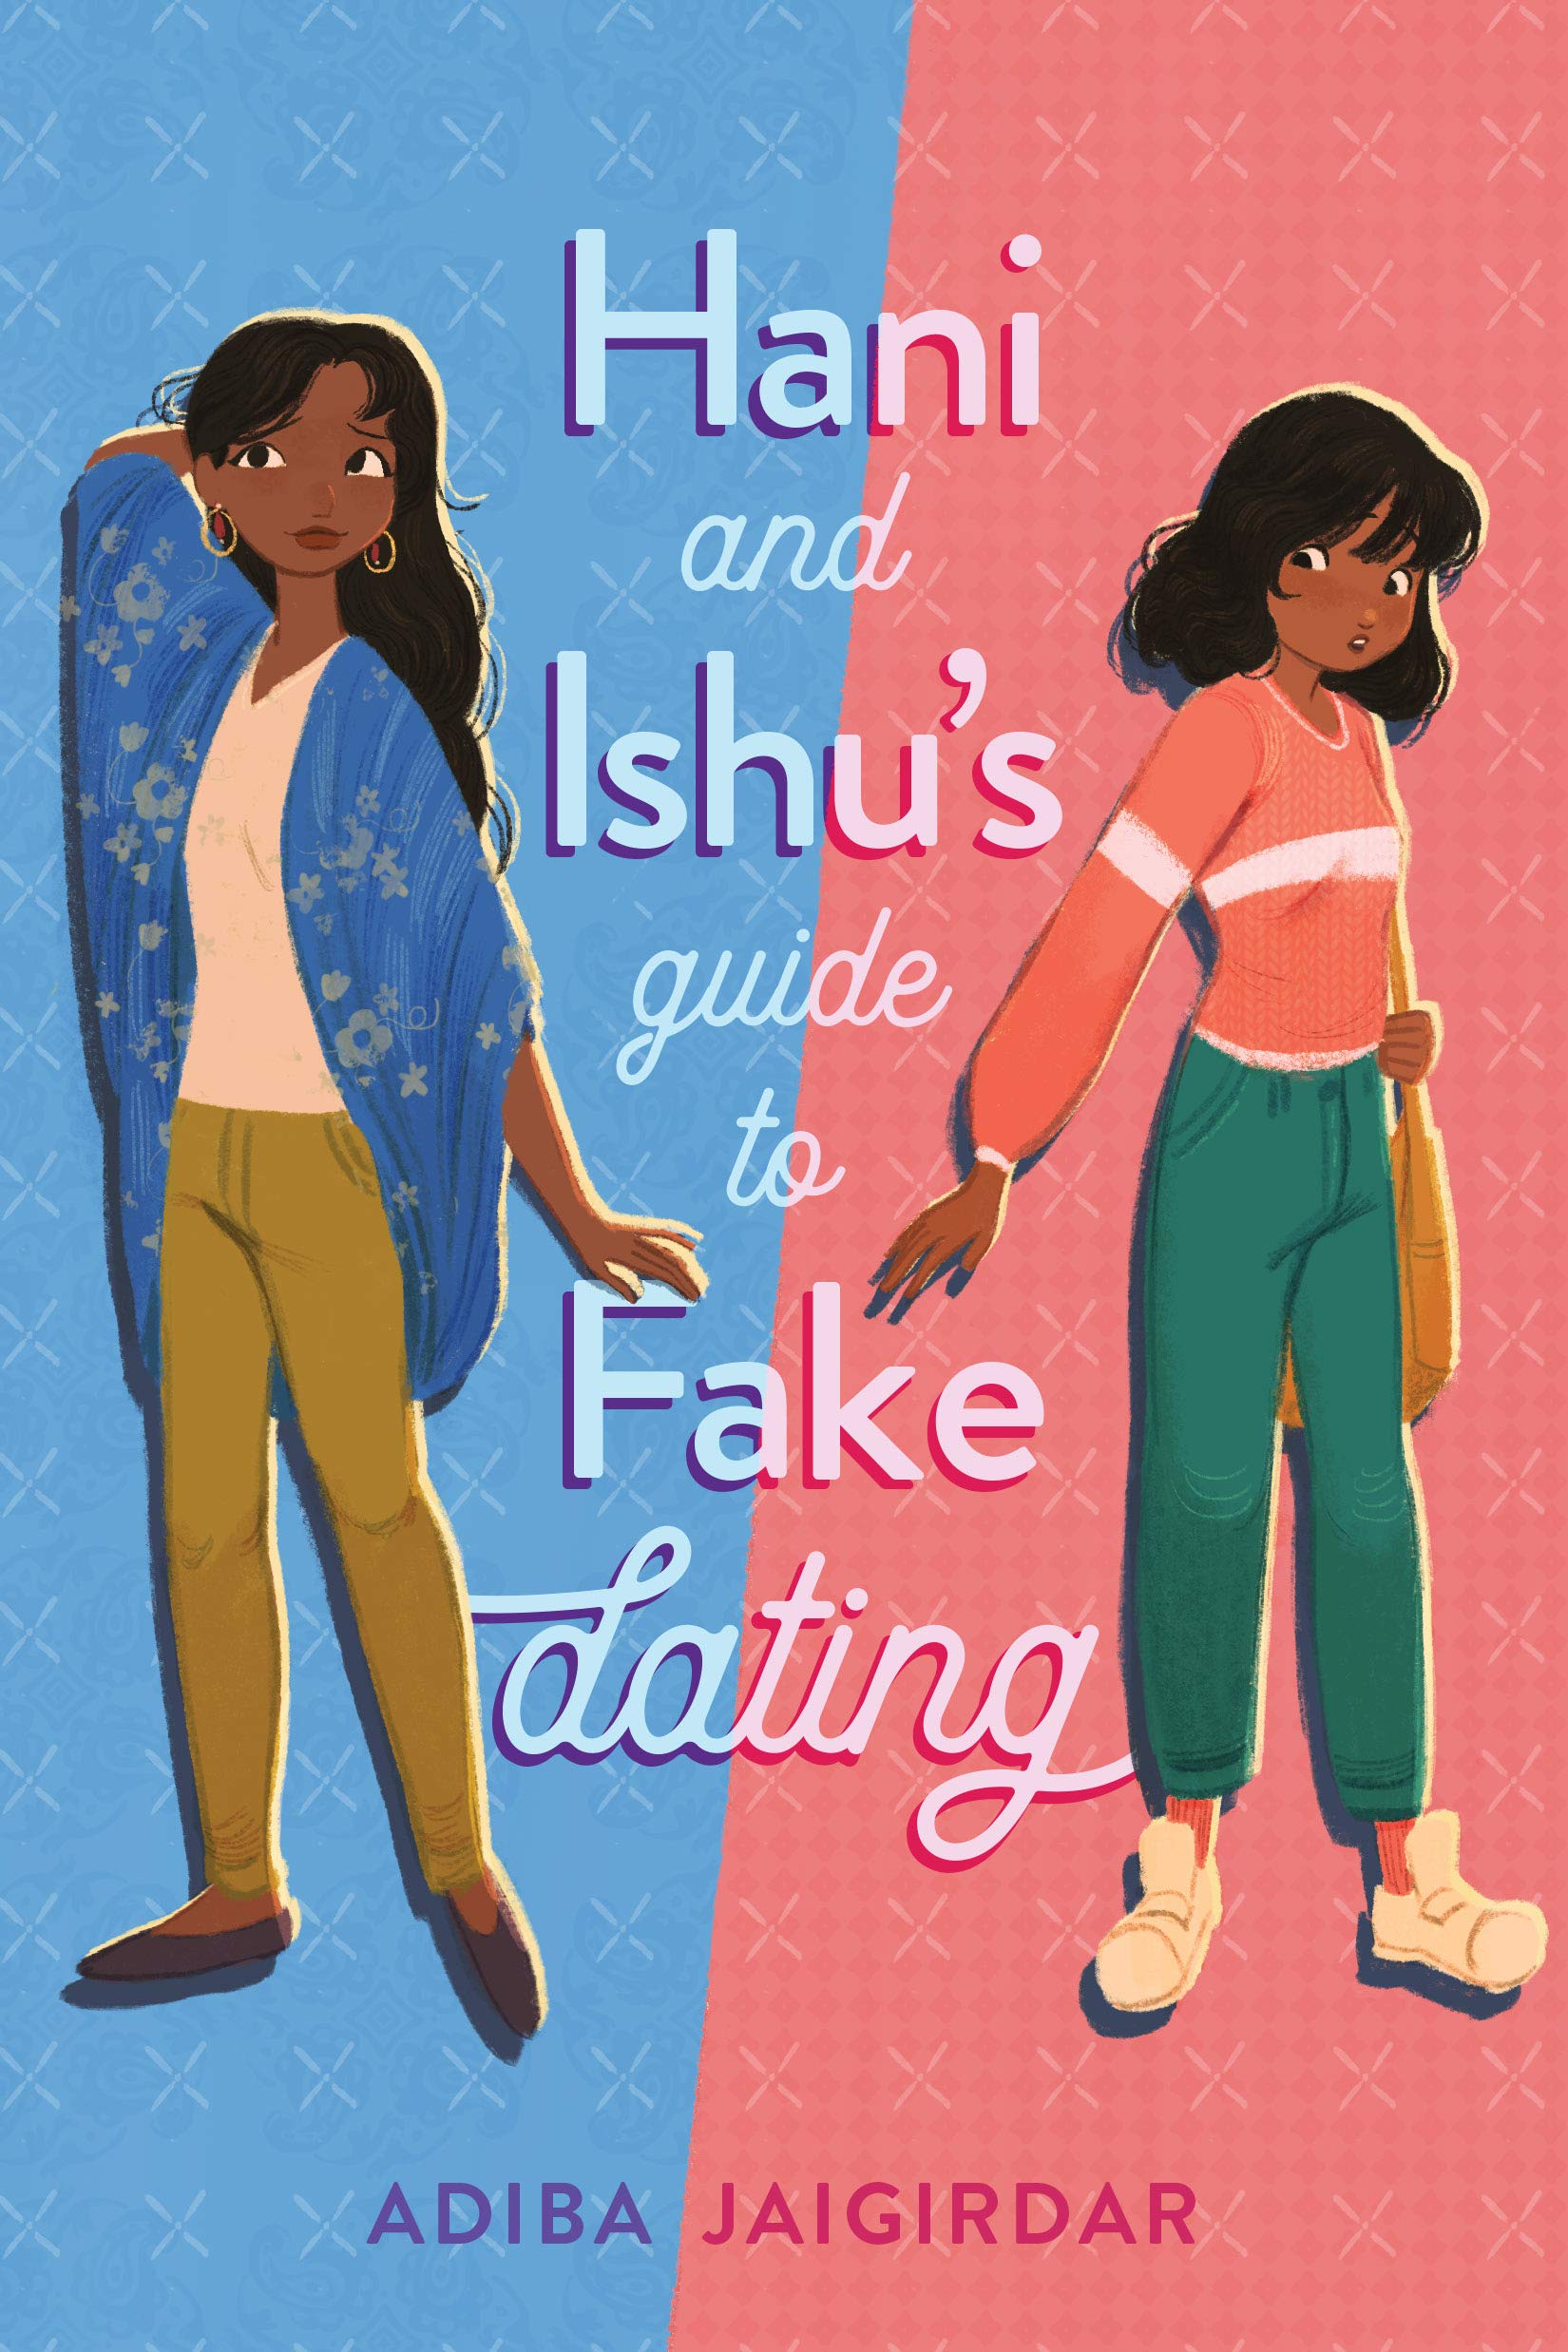 Amazon.com: Hani and Ishu's Guide to Fake Dating (9781645672579):  Jaigirdar, Adiba: Books